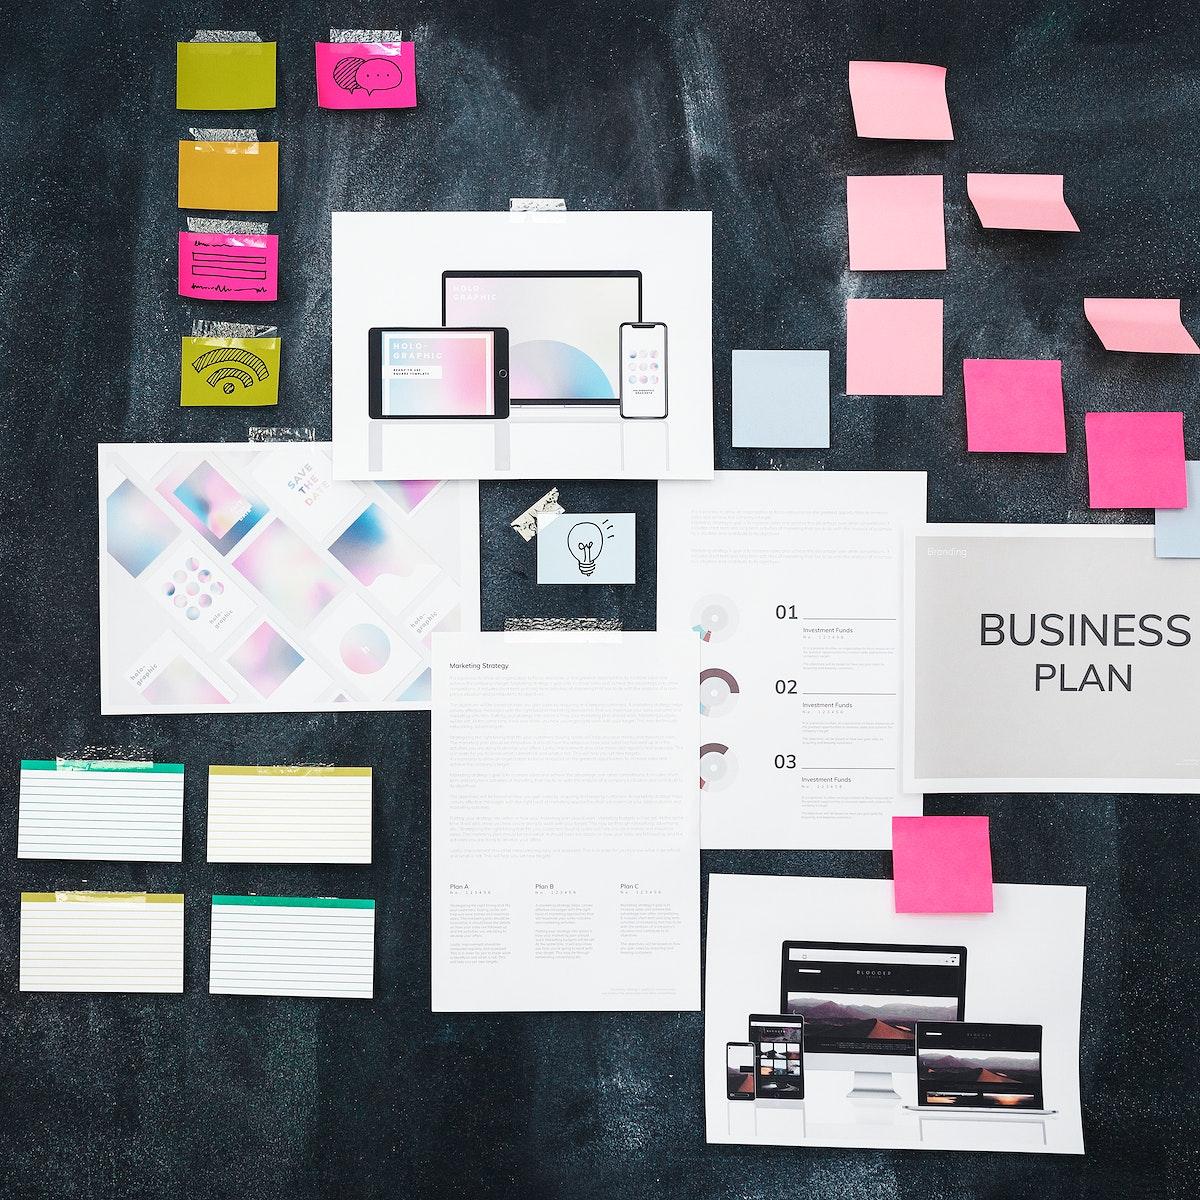 Business plan on a blackboard social ads template